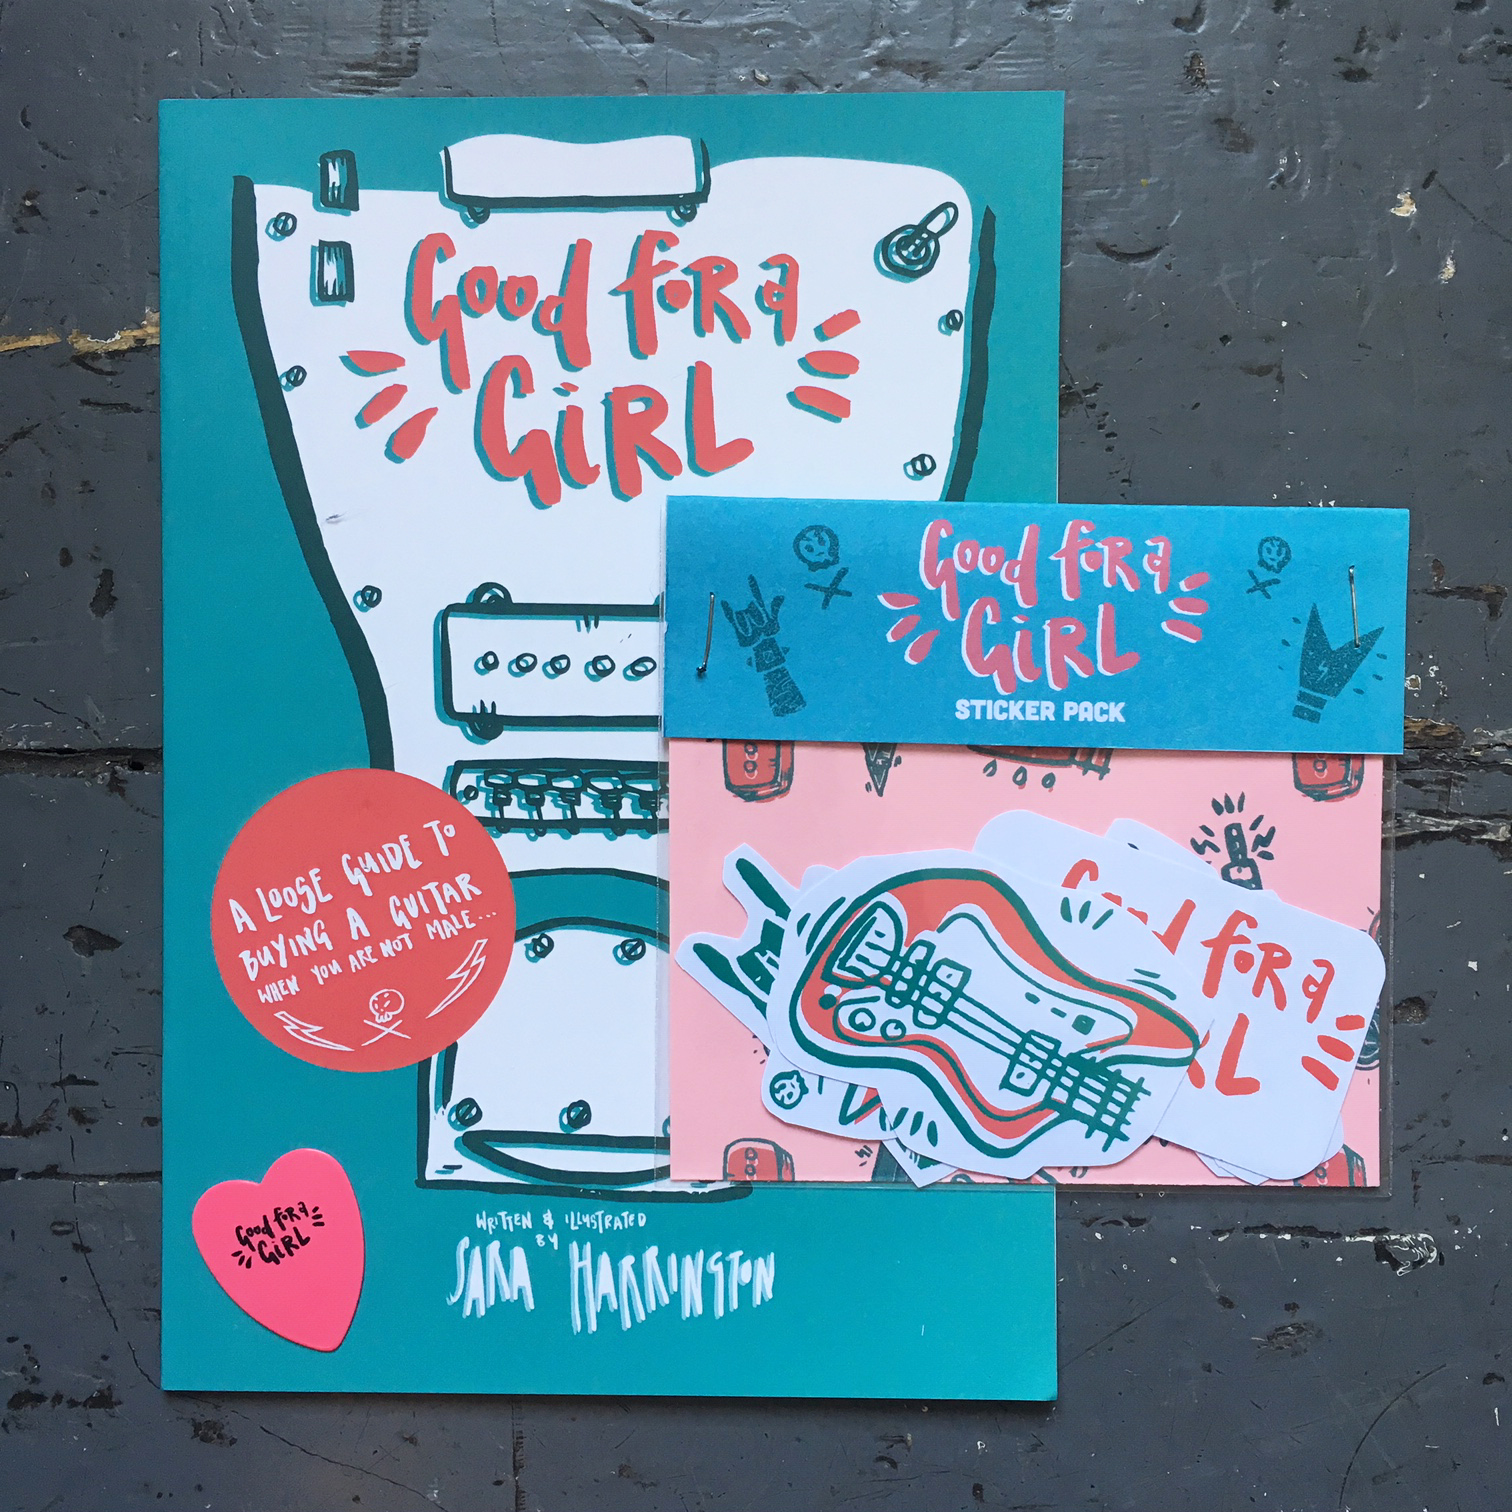 Good For A Girl - Zine, Sticker Pack & Plectrum